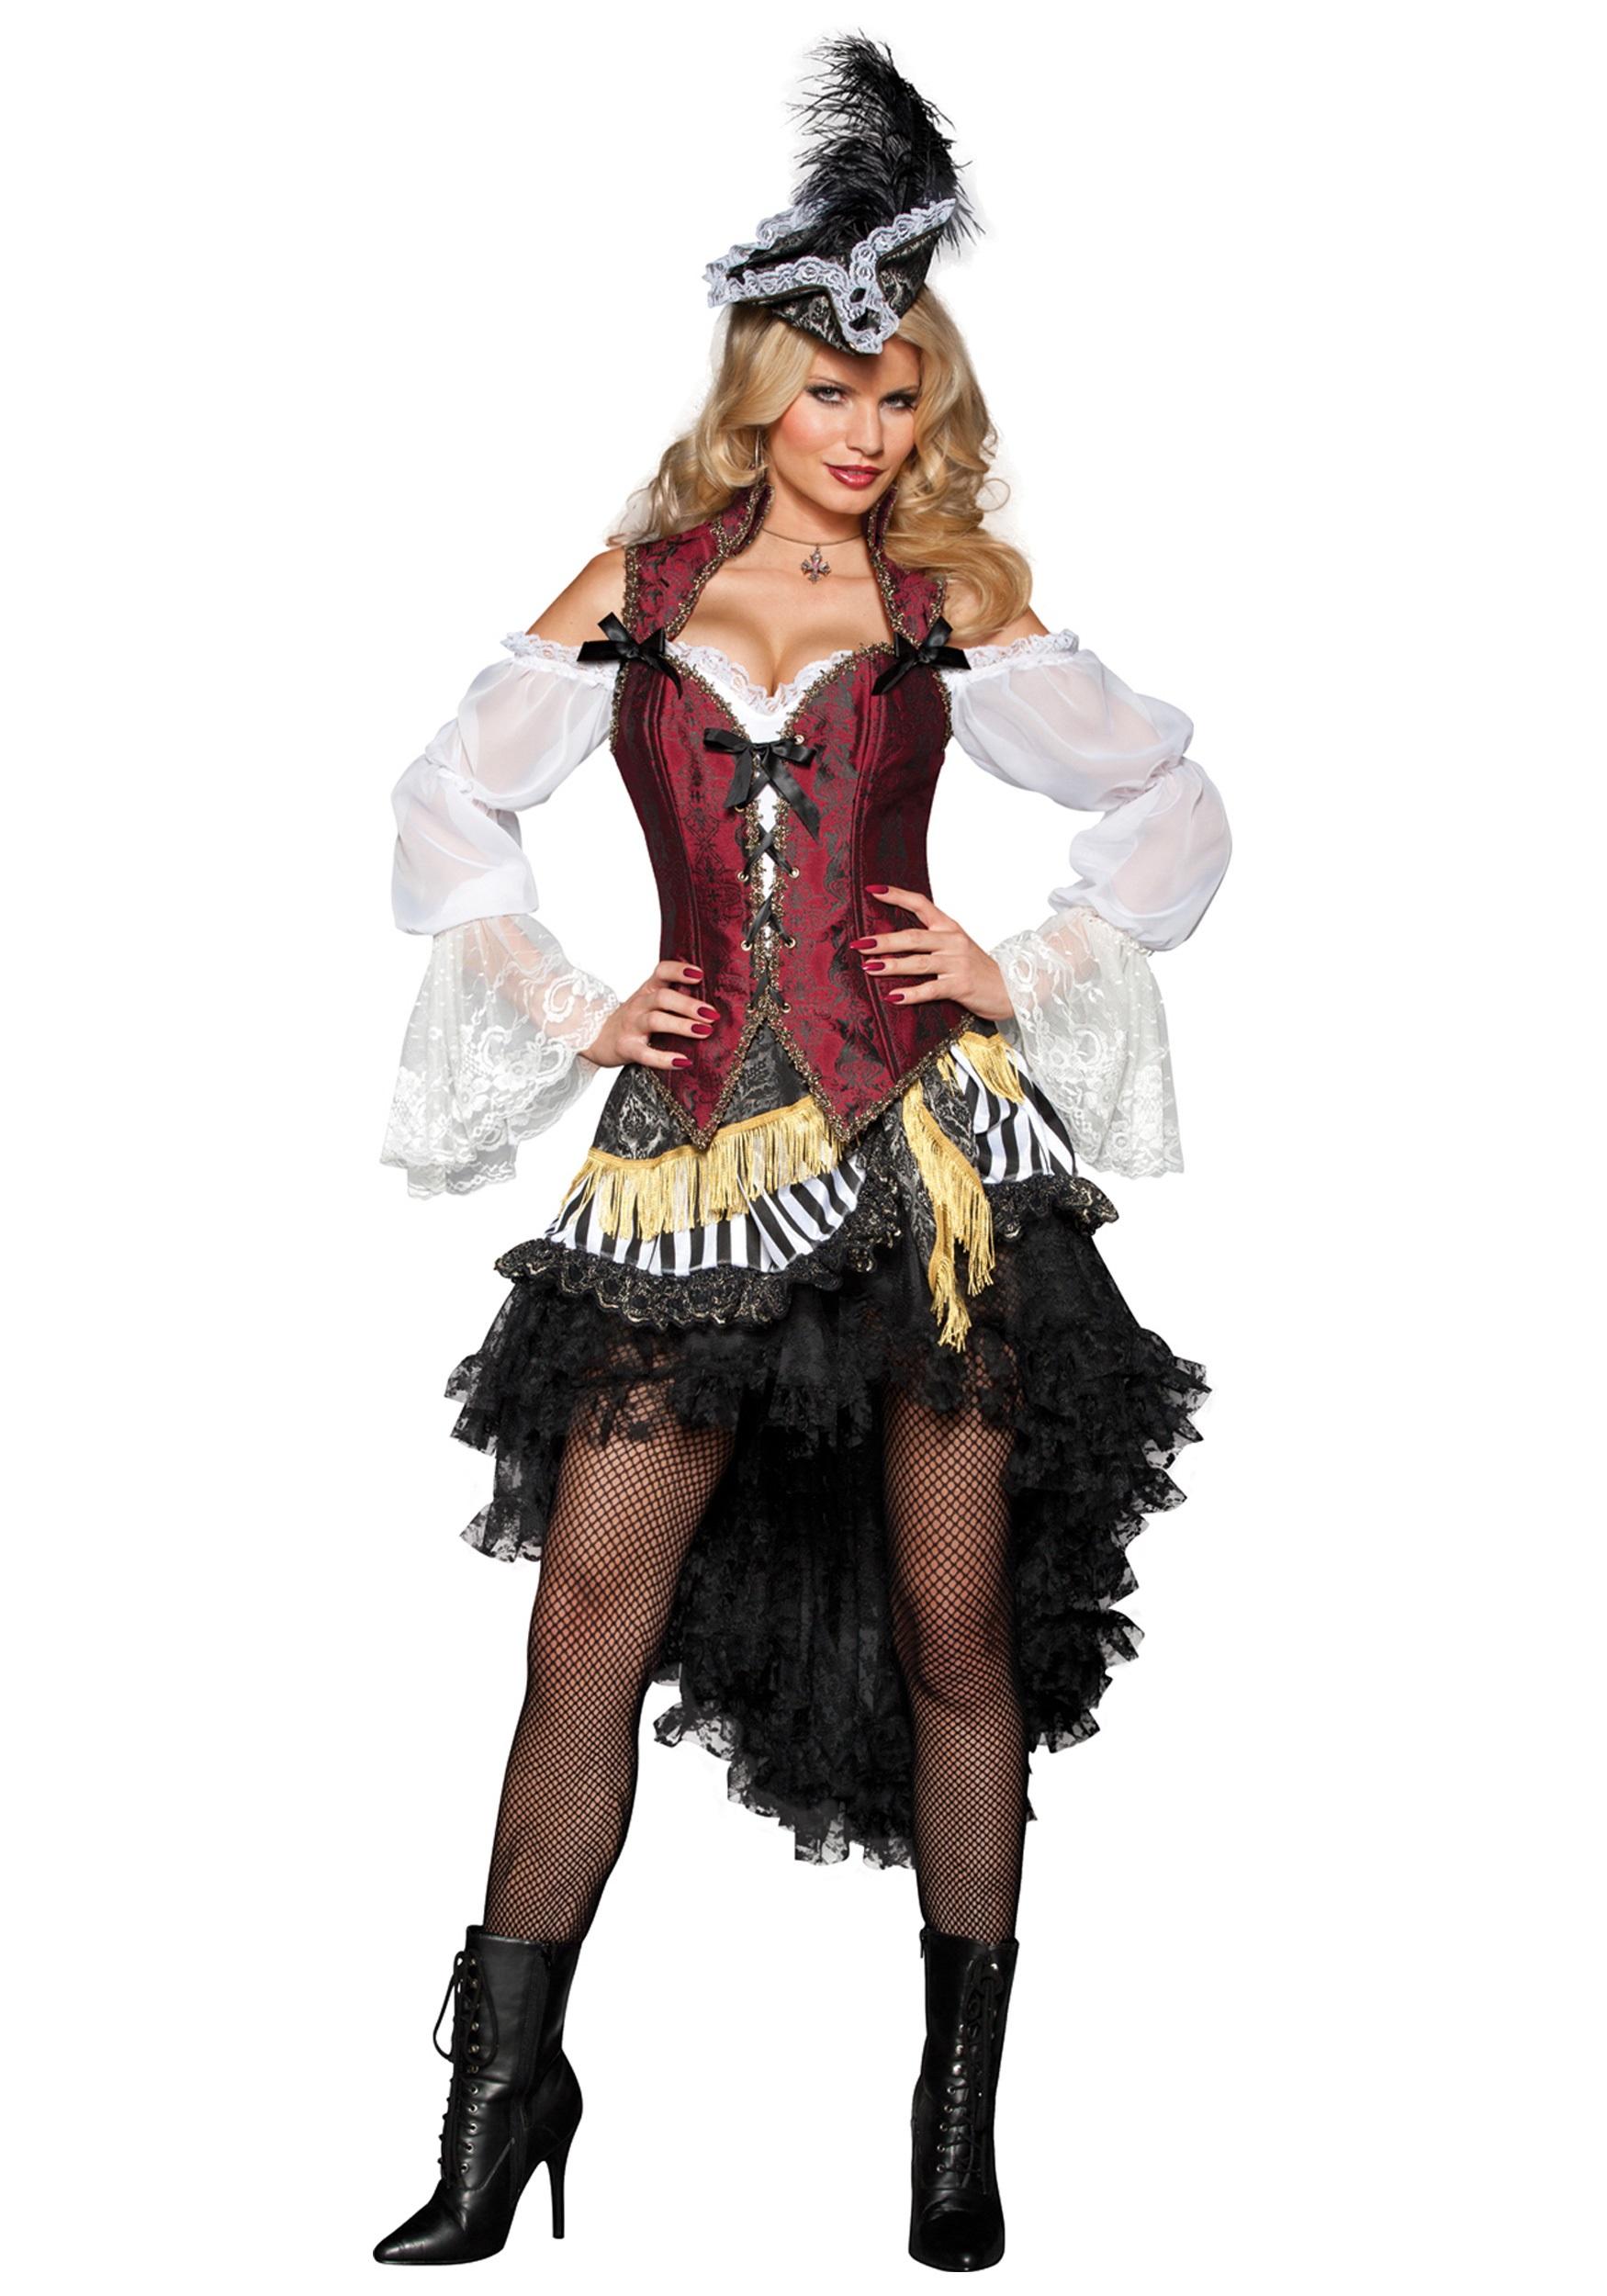 Sexy High Seas Pirate Costume  sc 1 st  Halloween Costumes & Sexy High Seas Pirate Costume - Halloween Costumes